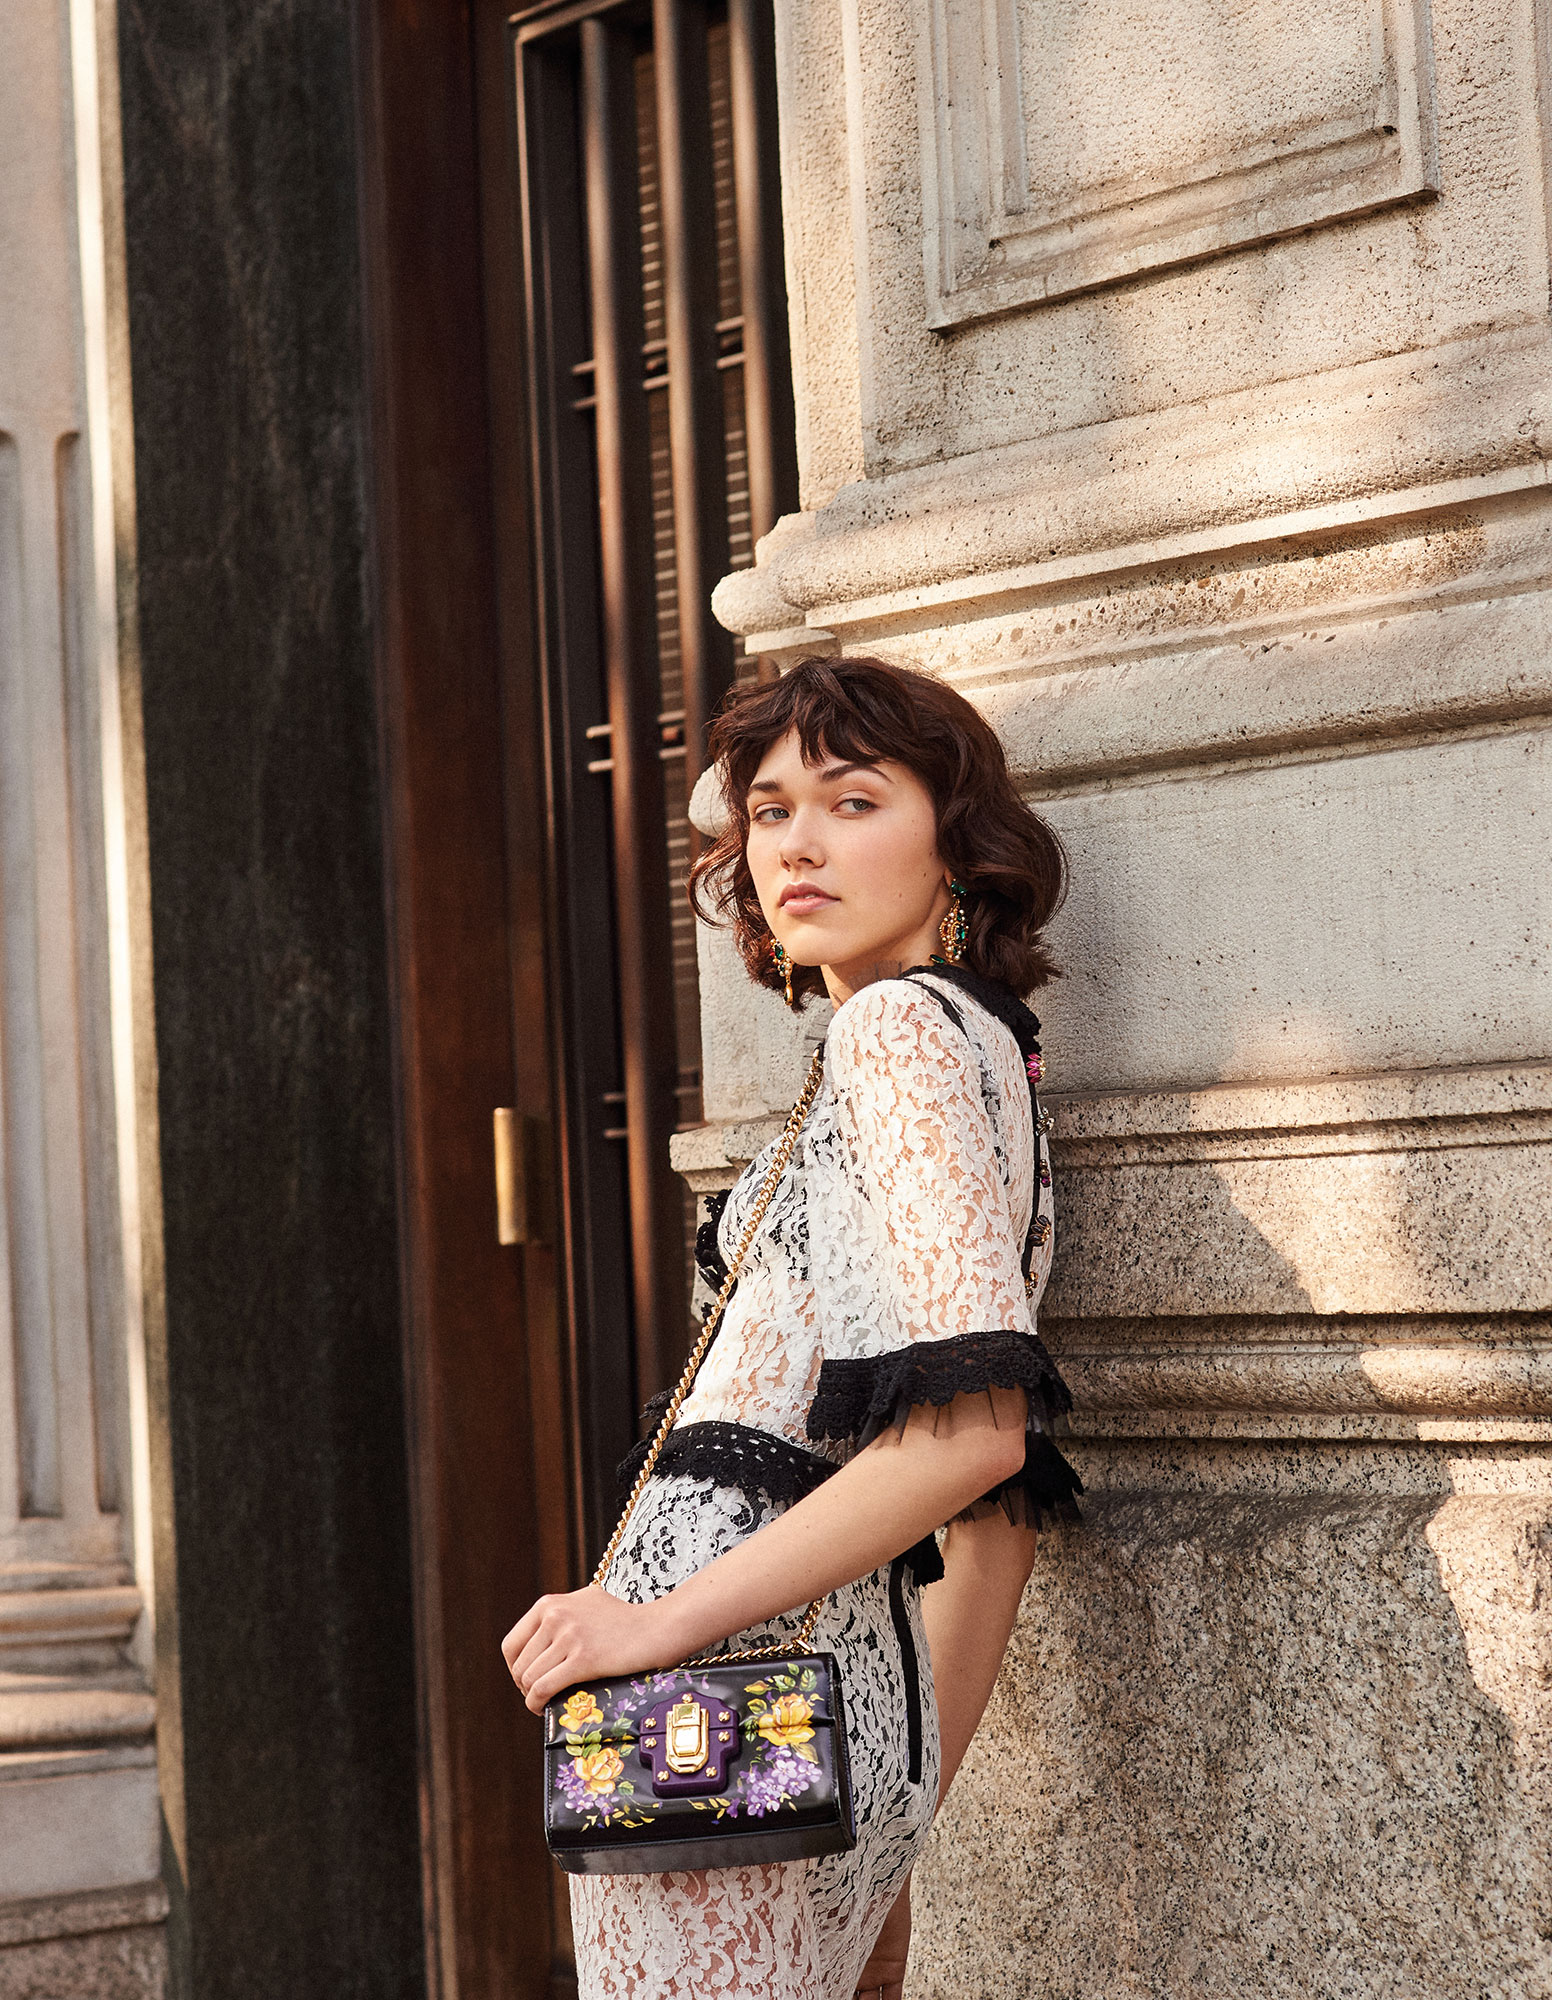 Gioia! May 2017 | Federico Sorrentino | Gioia | Rossana Passalacqua | Numerique Retouch Photo Retouching Studio